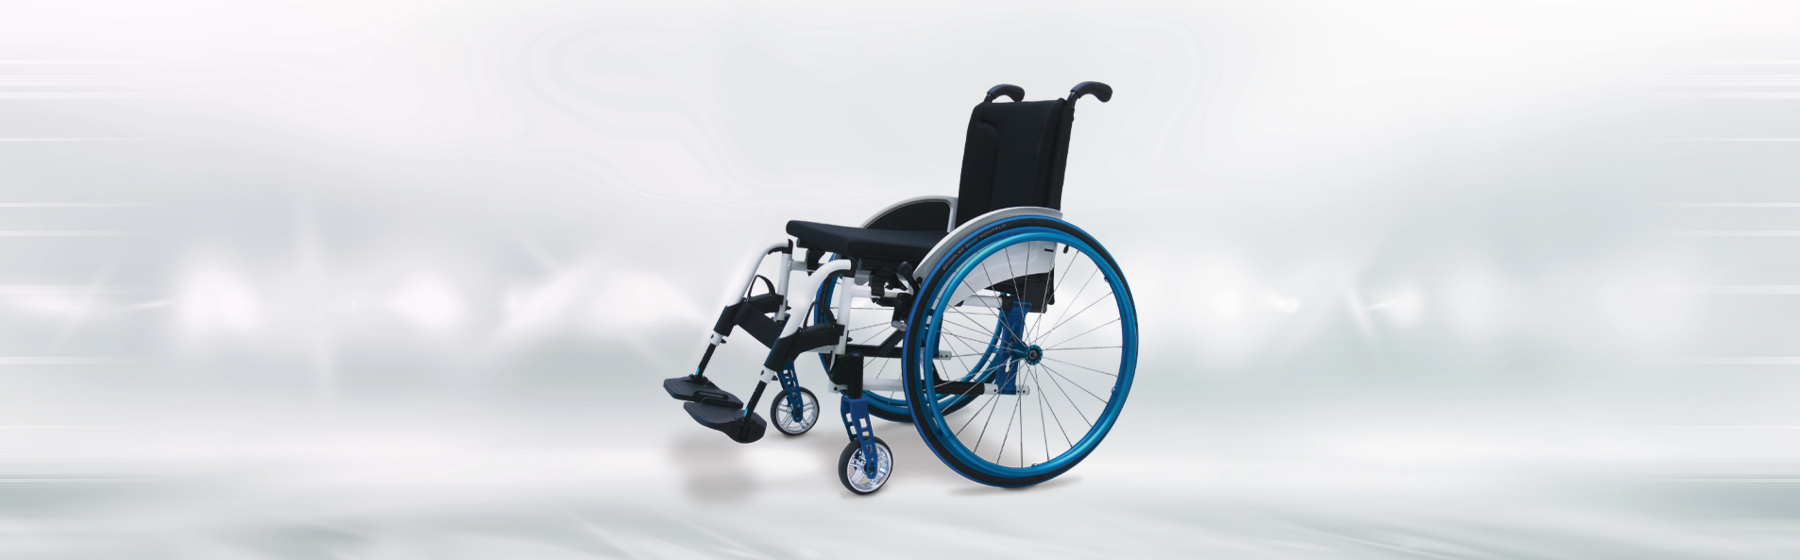 SMB-Mobilitaet-Rubrikenmotiv-Rollstuehle